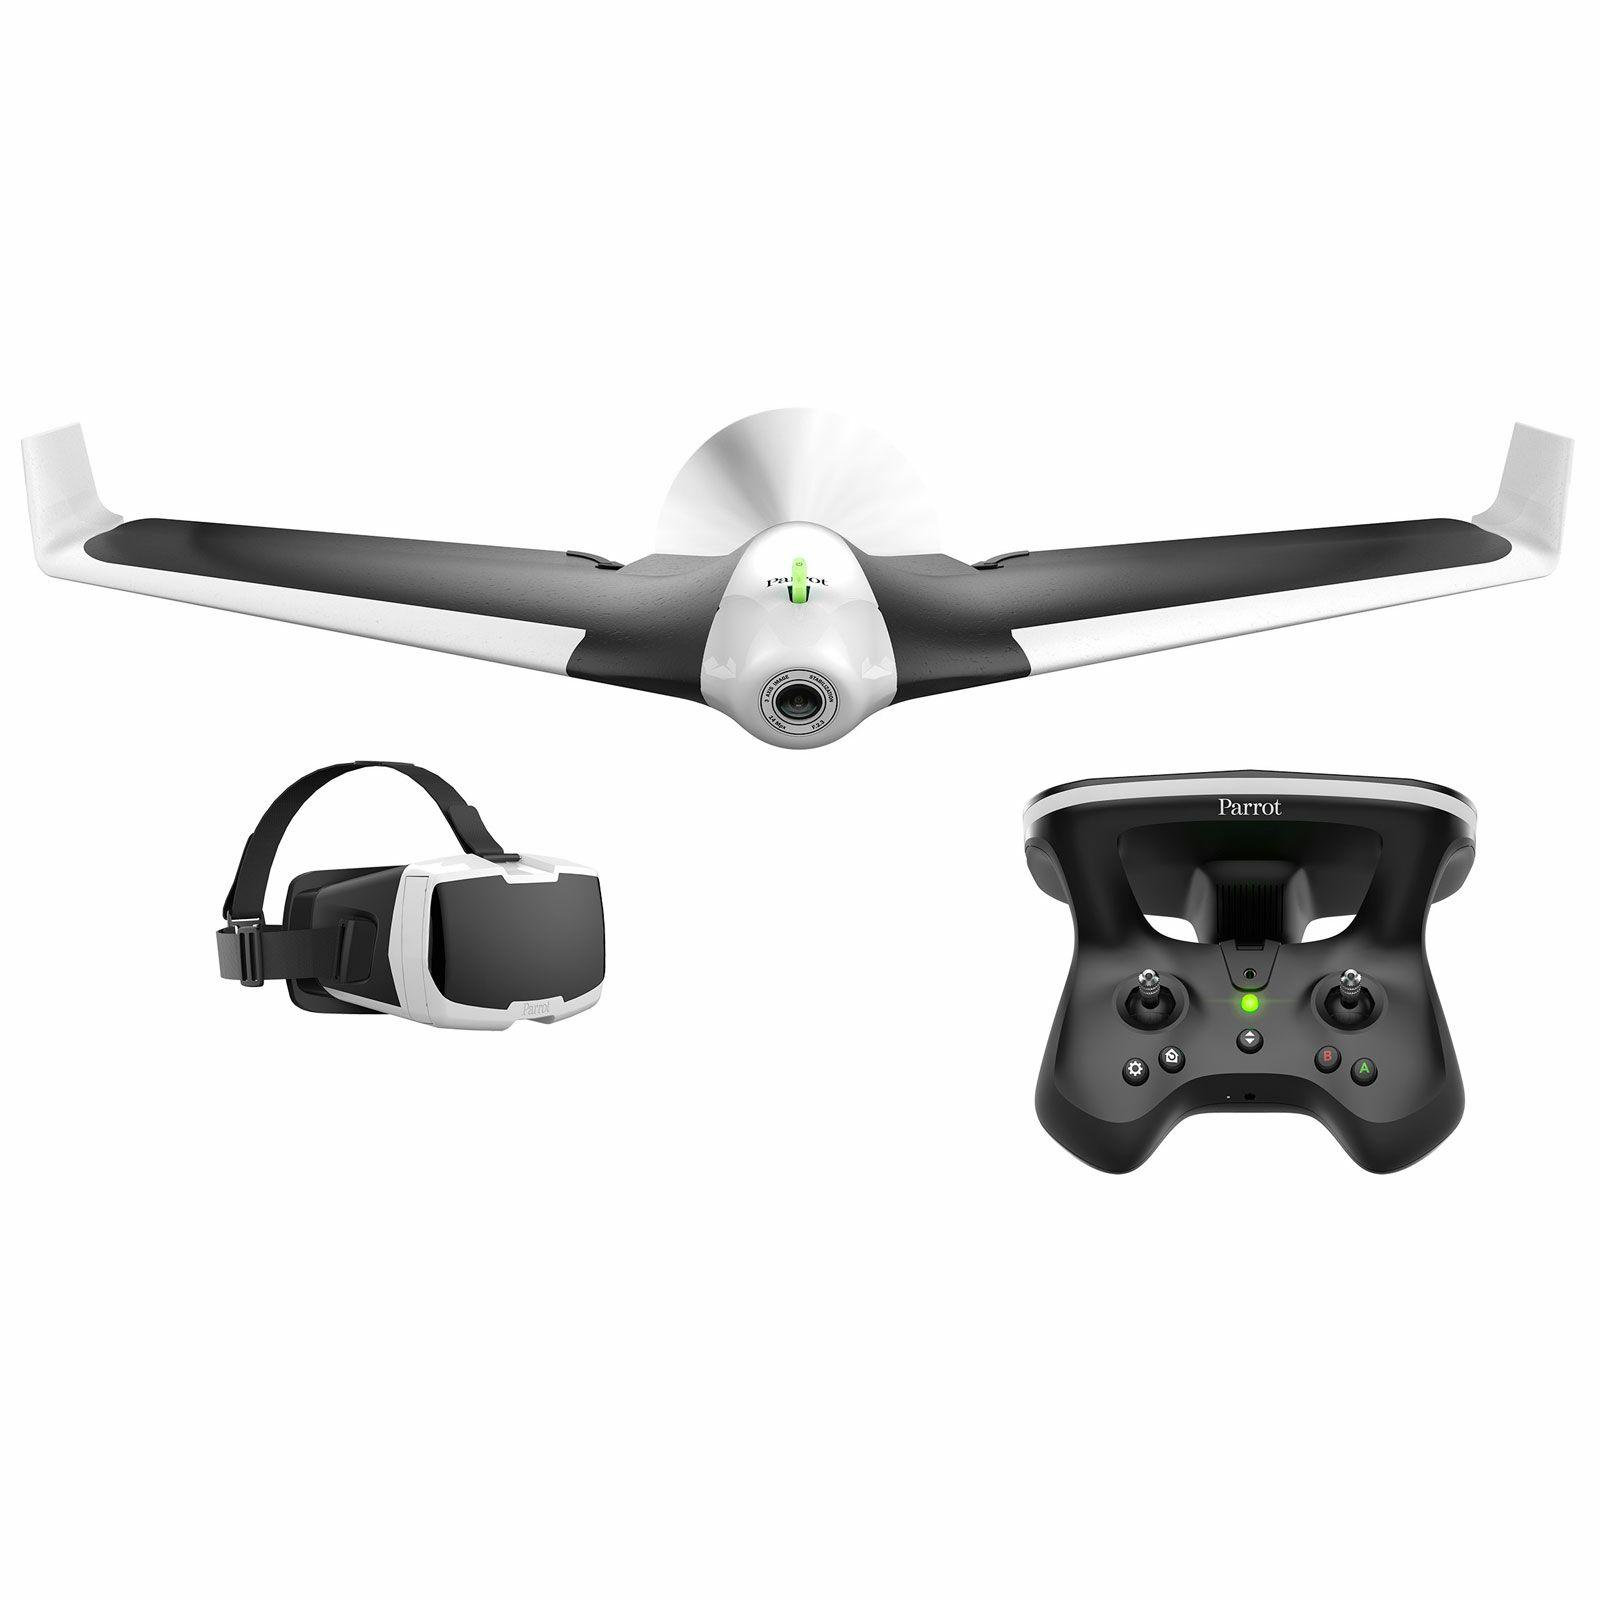 Drone Parrot Disco FPV + Skycontroller + Lunettes Action-Cam Caméra Wow